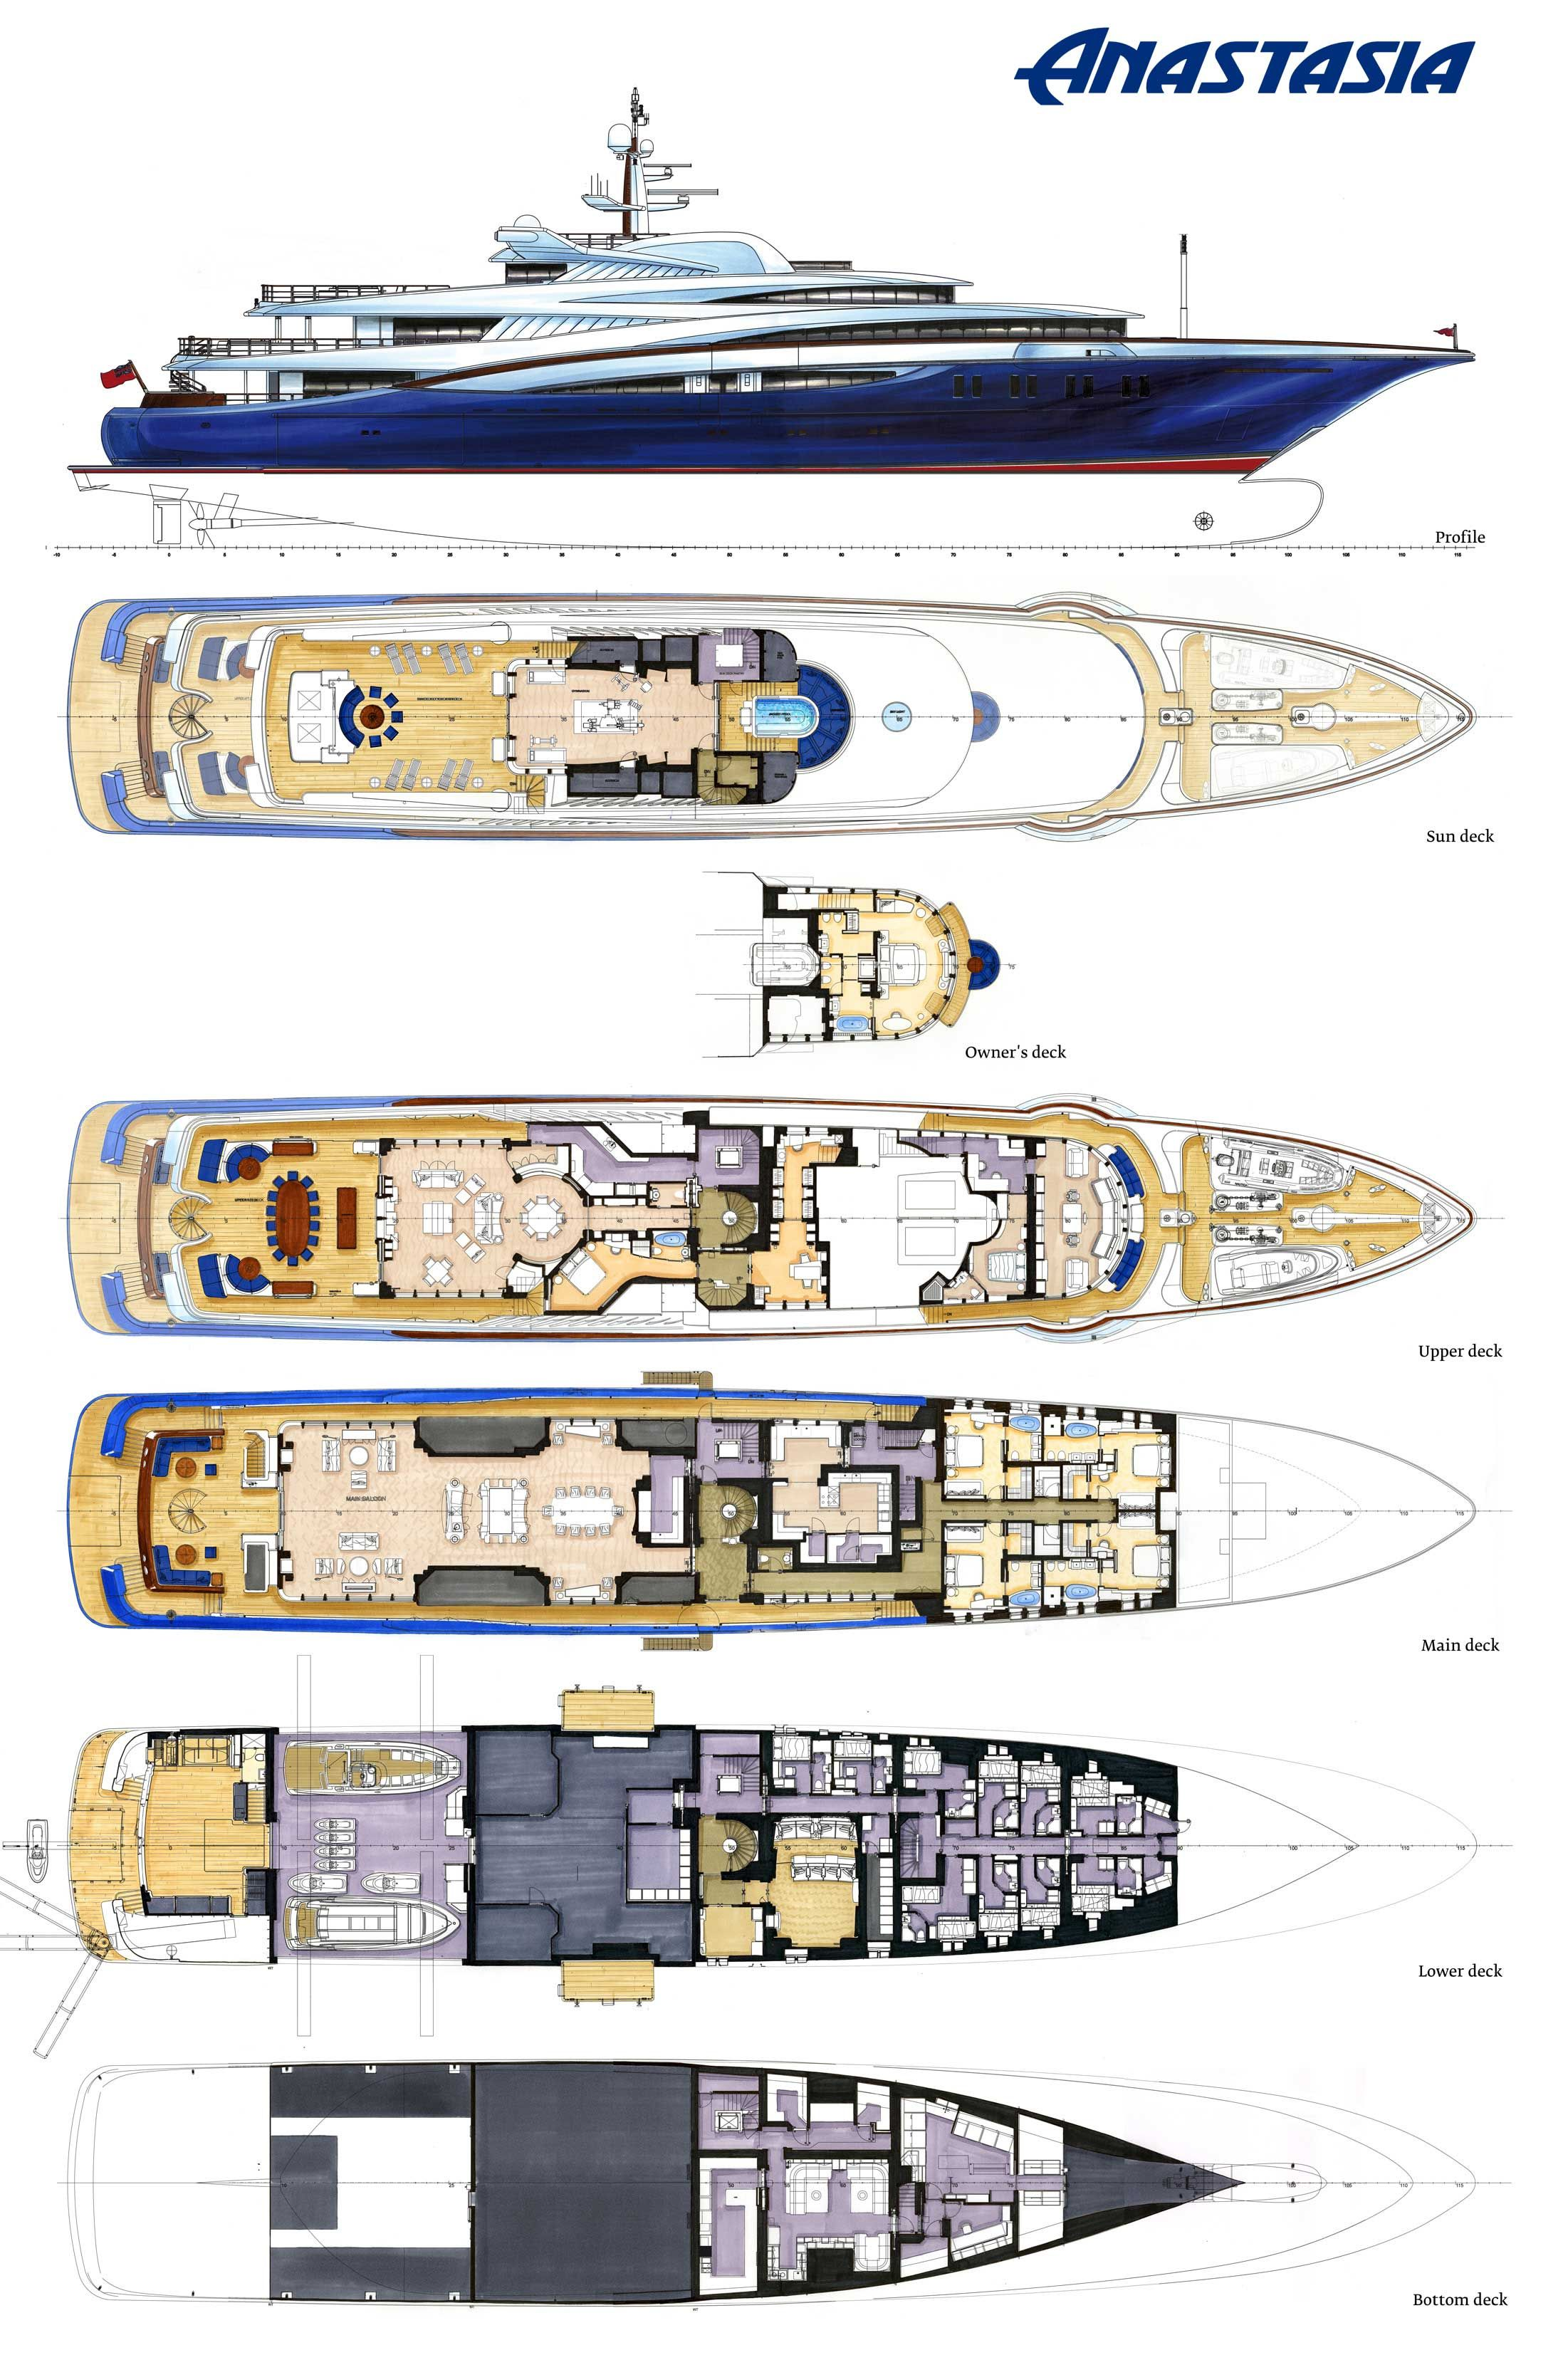 luxuryyachtinterior  8c8b29bbba6